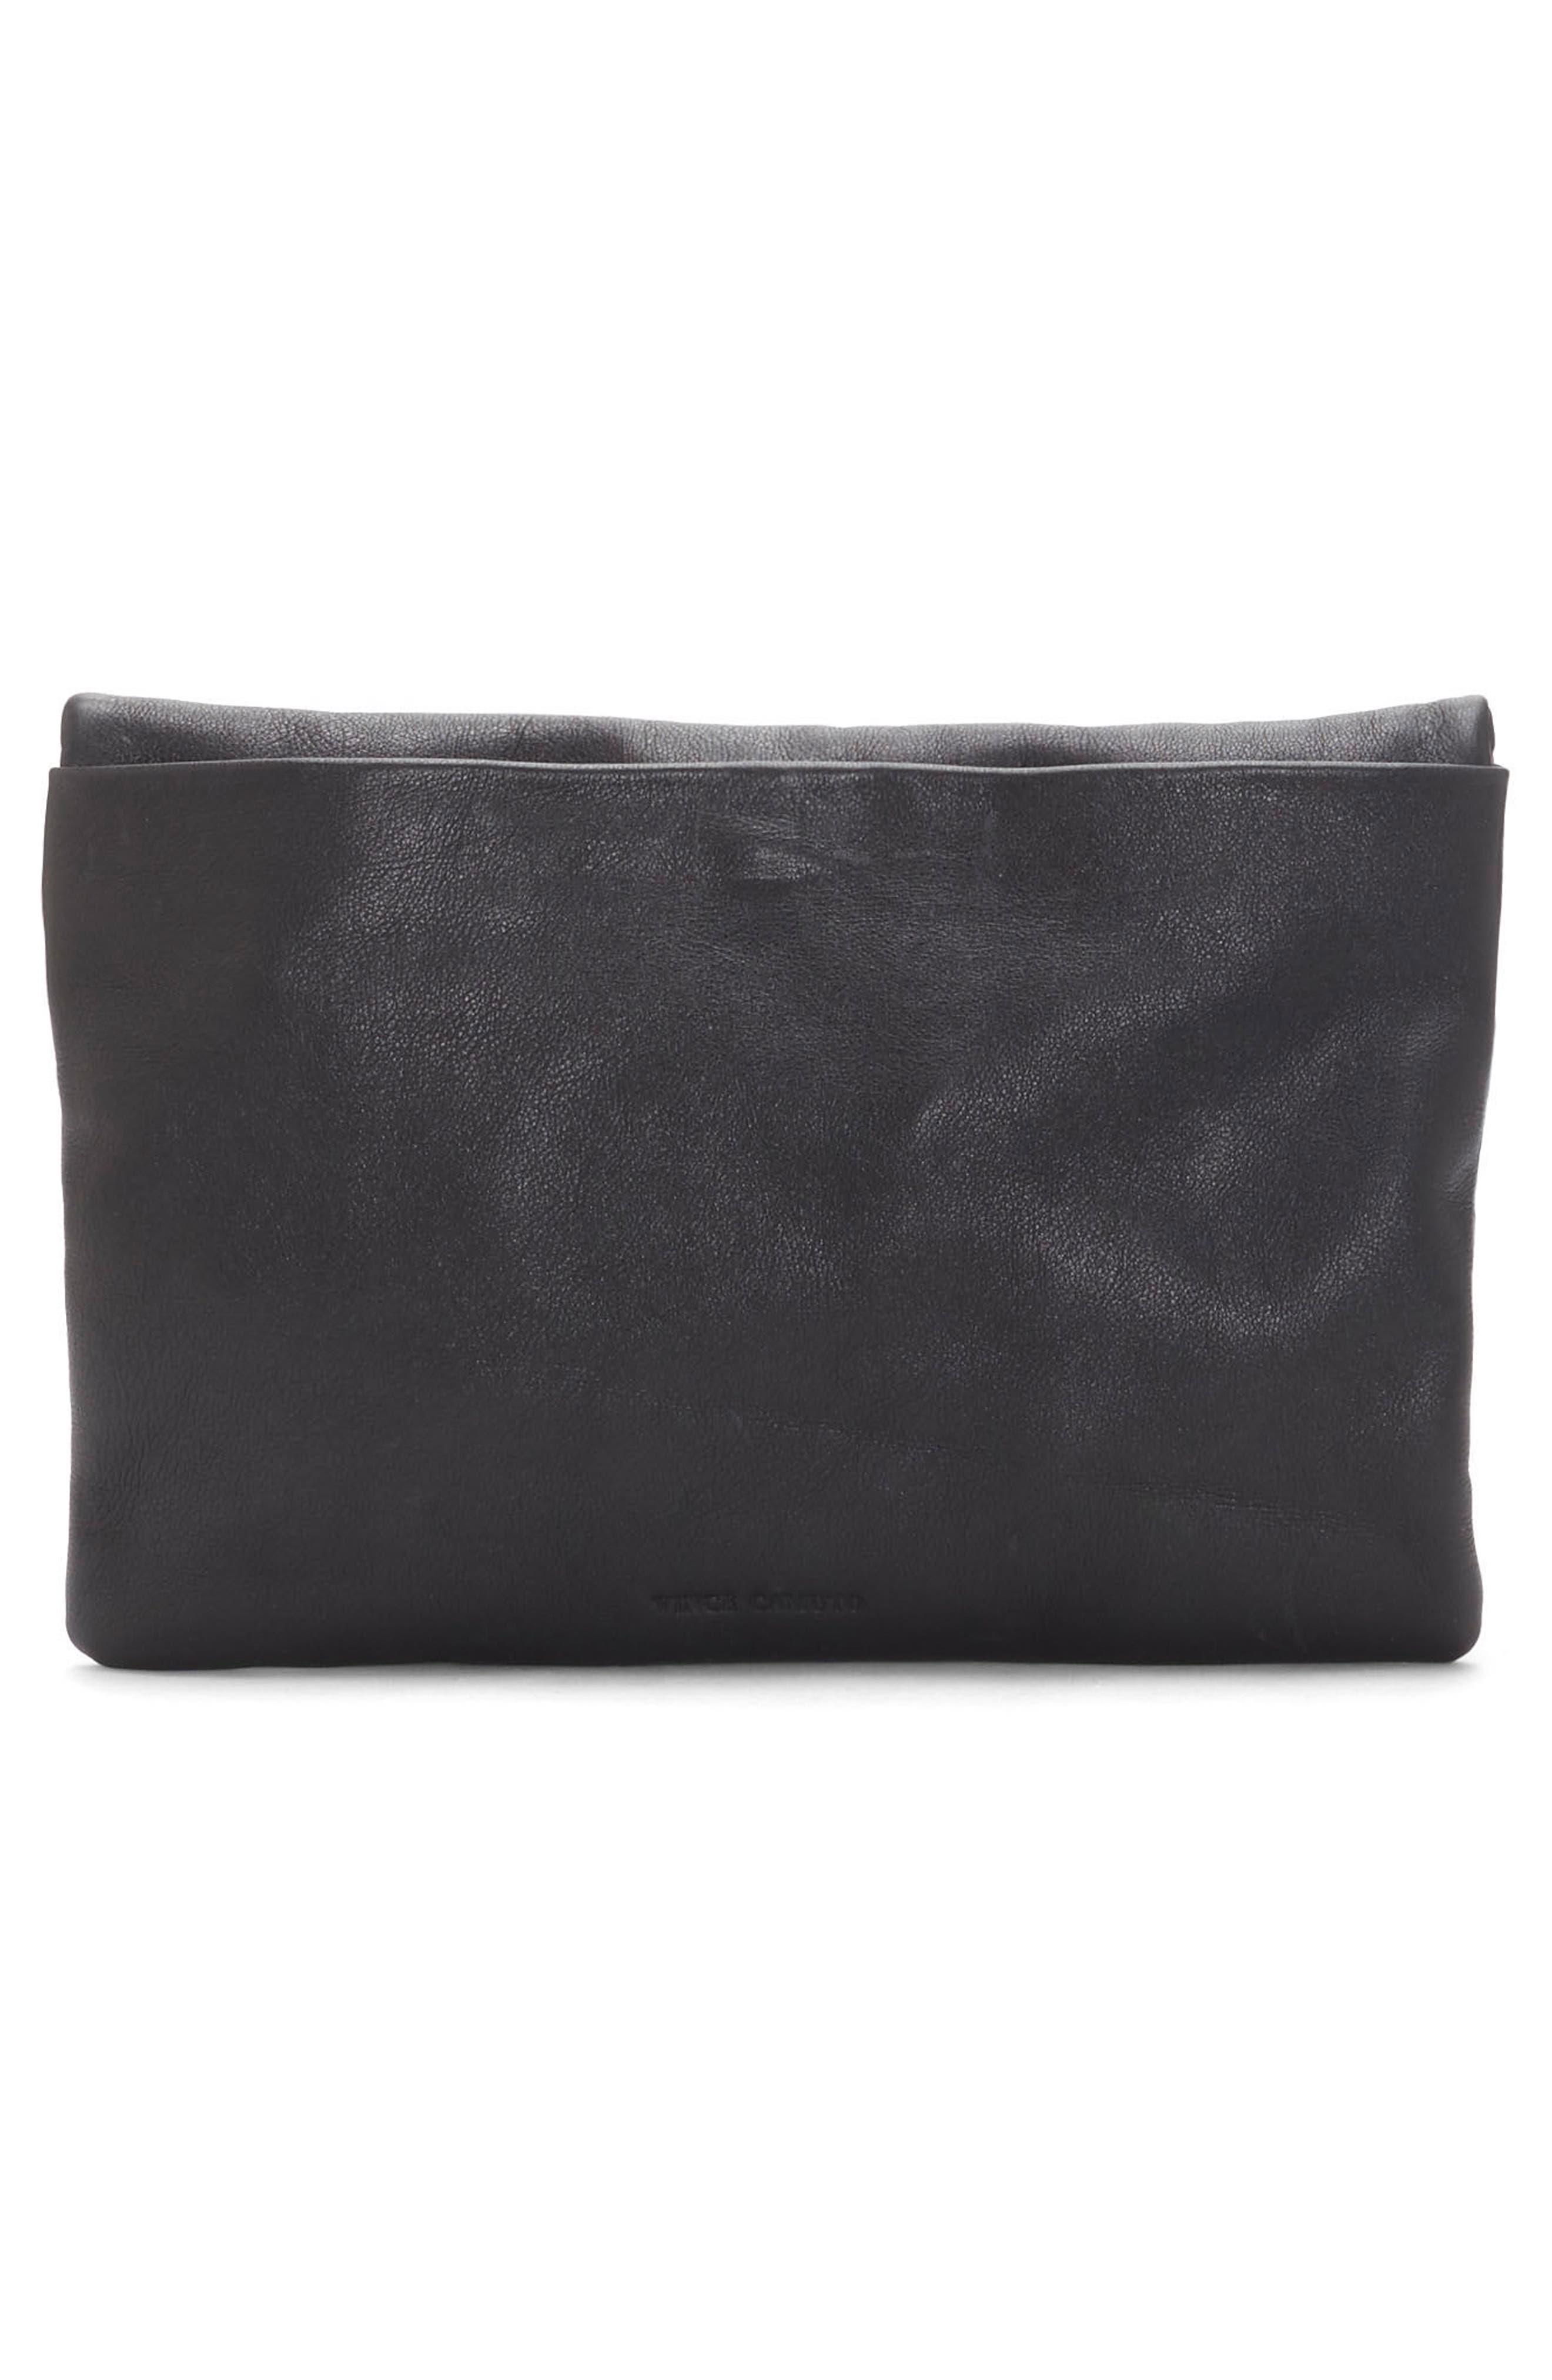 Alternate Image 2  - Vince Camuto Luk Leather Foldover Clutch